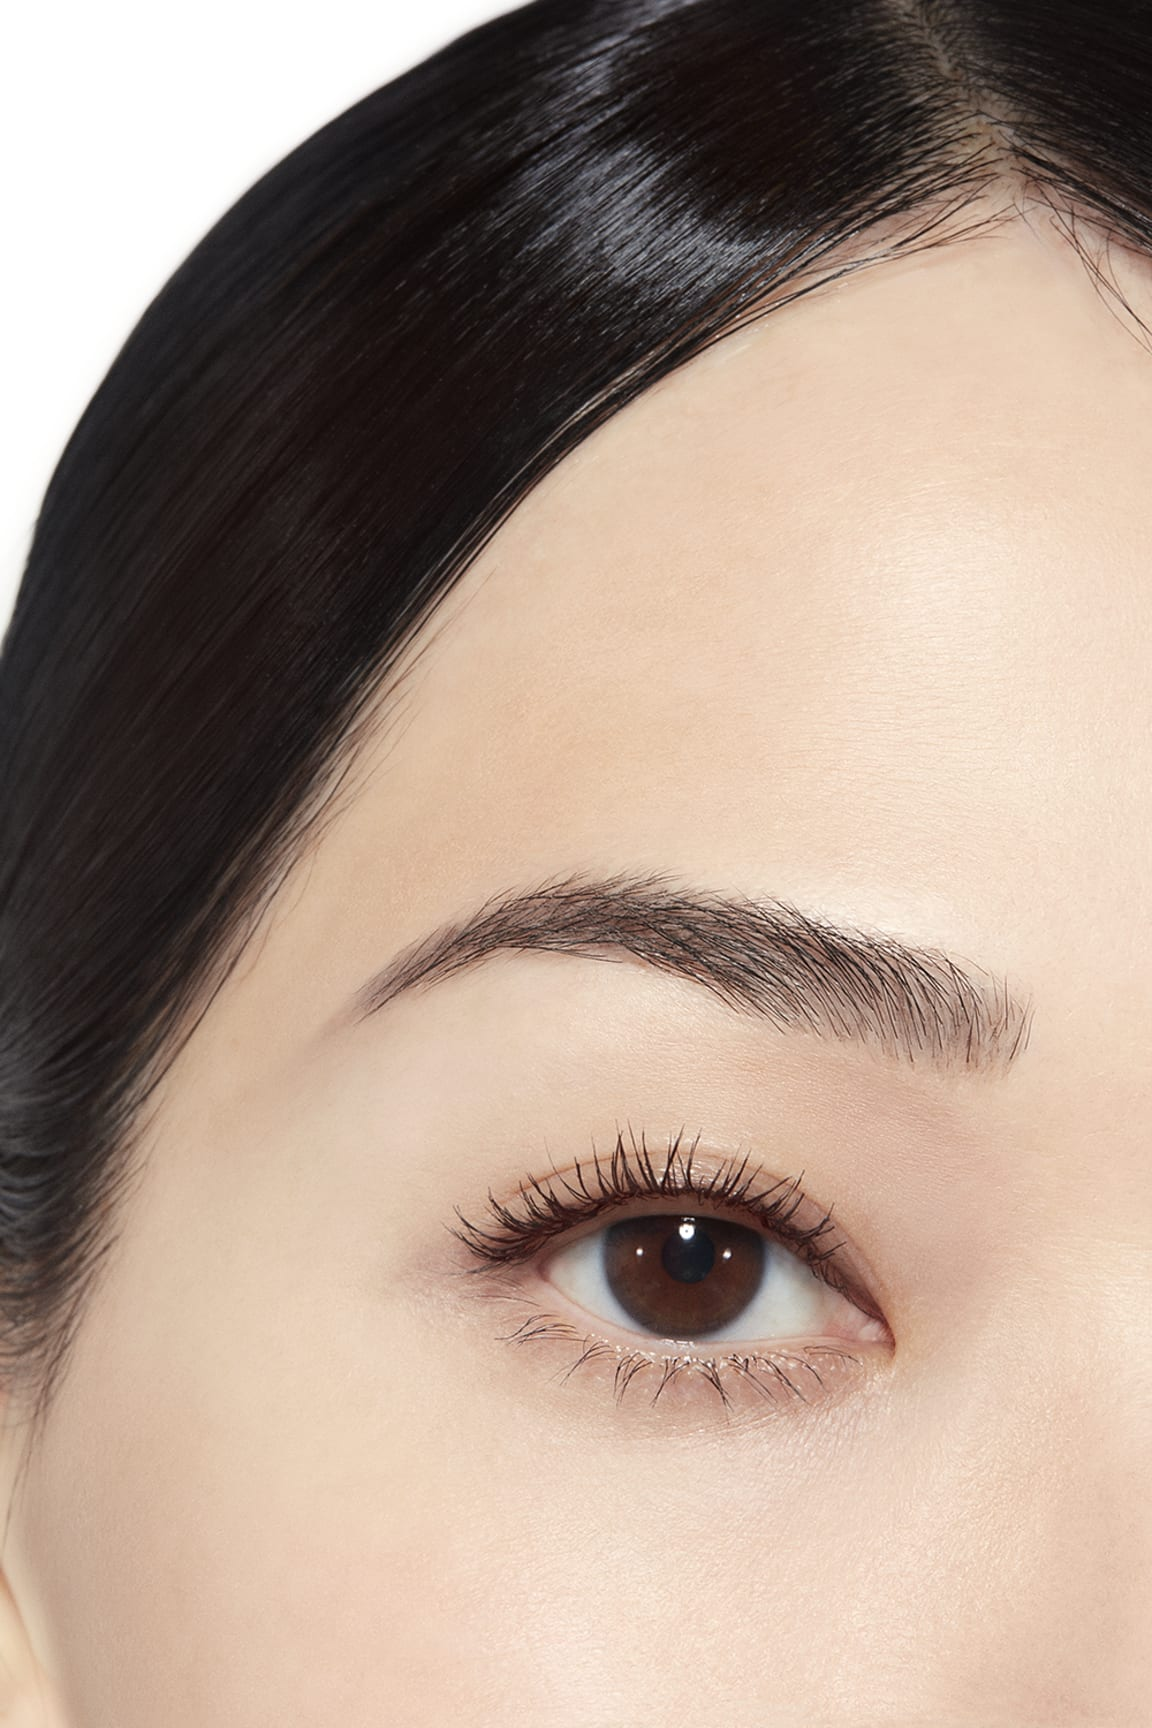 Application makeup visual 1 - INIMITABLE 30 - NOIR BRUN